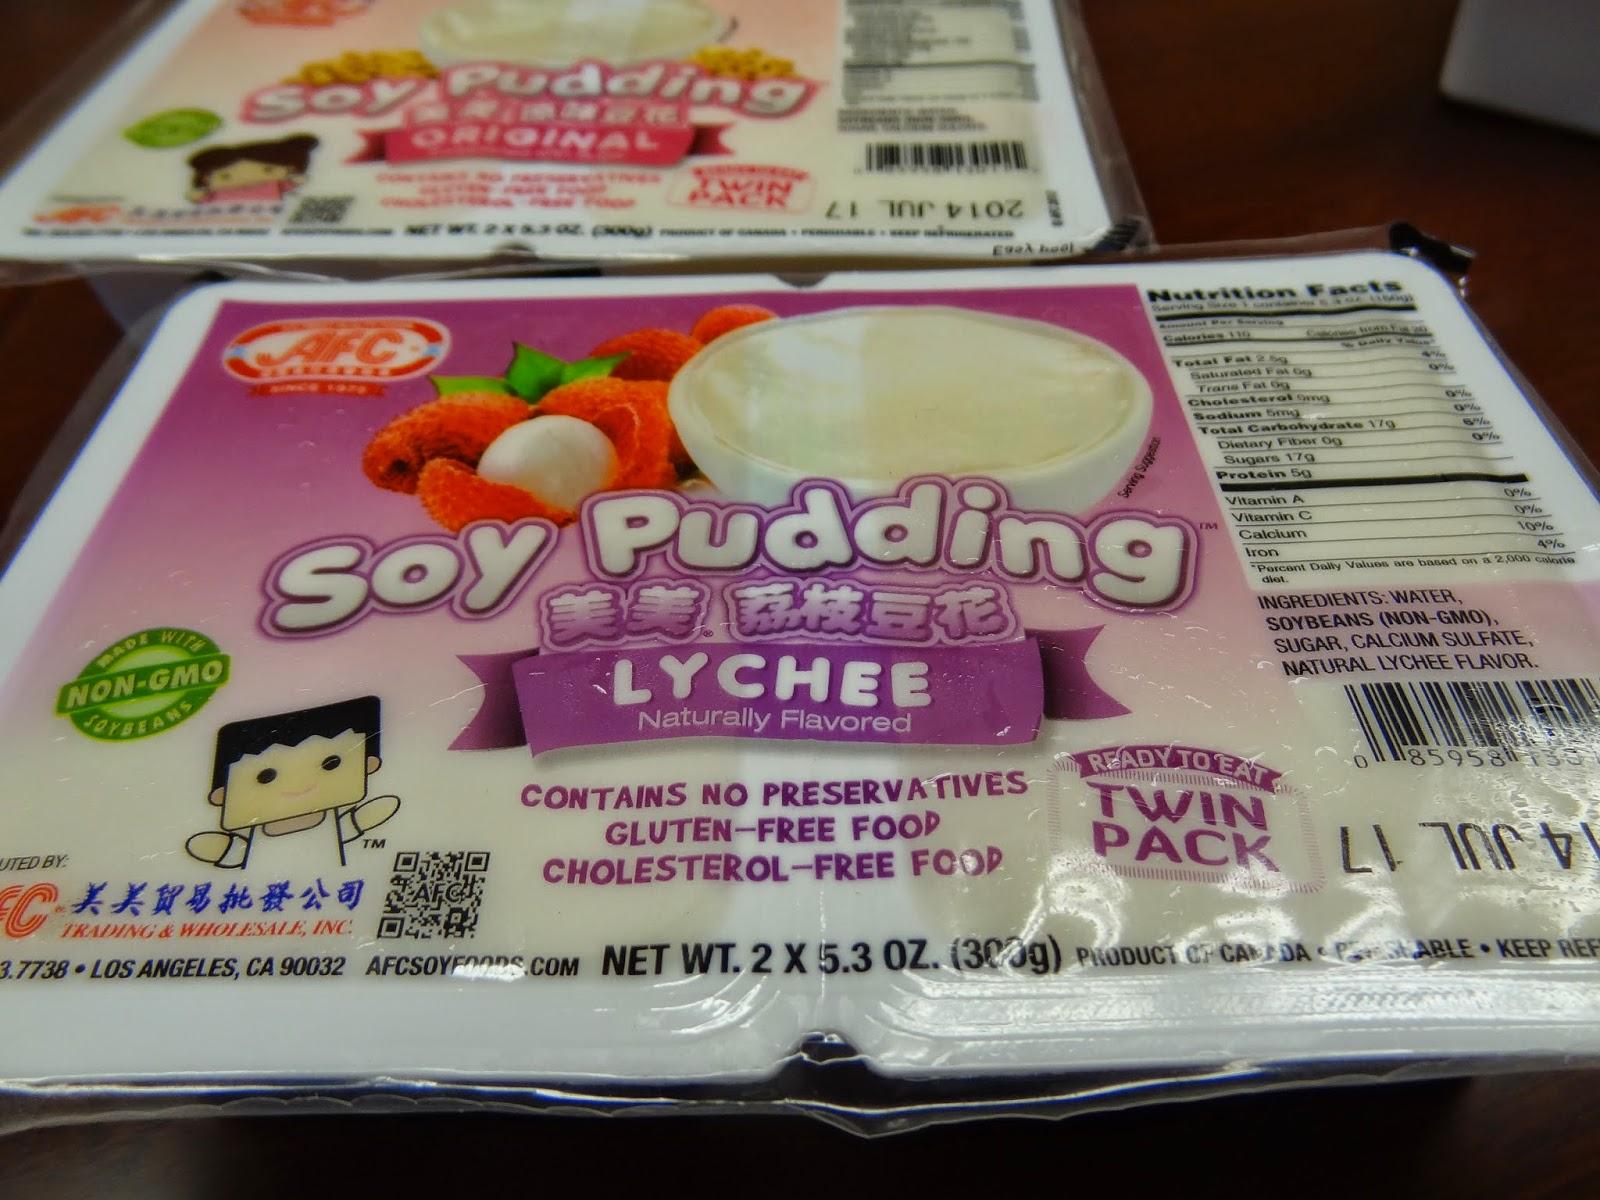 Free Soy Pudding At 626 Night Market